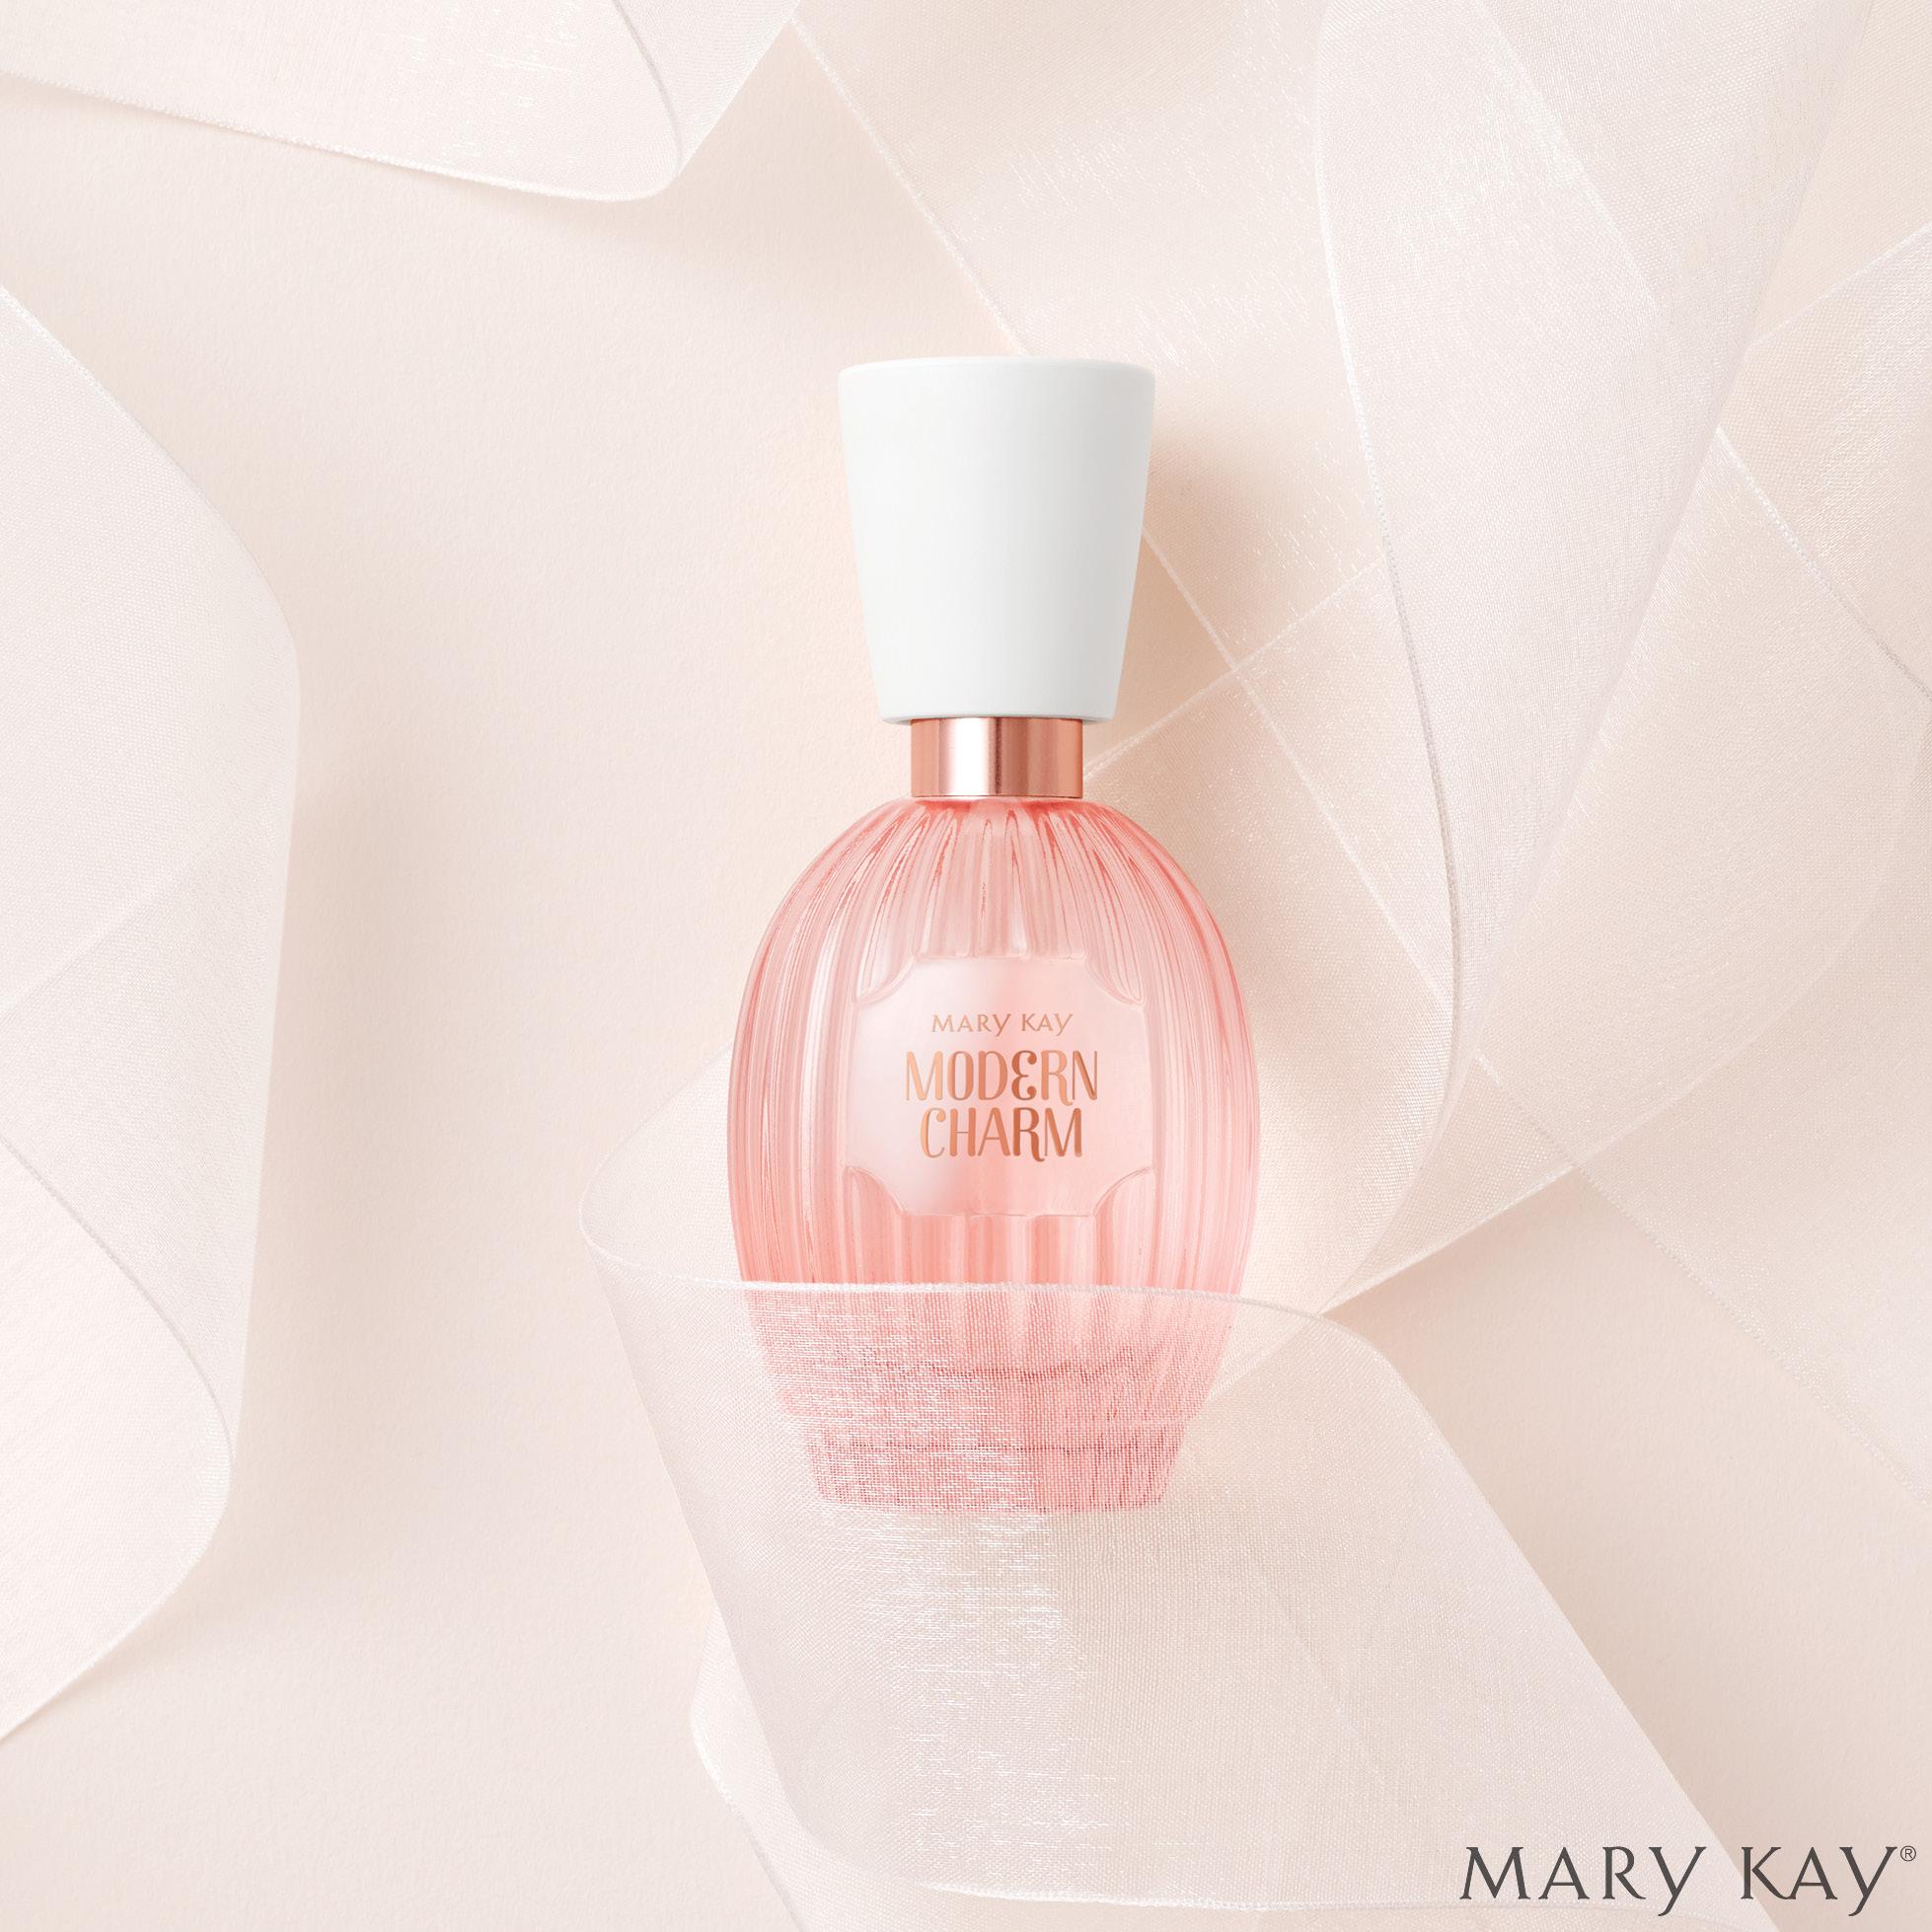 mary-kay-modern-charm-post-launch-gifting-5.jpg